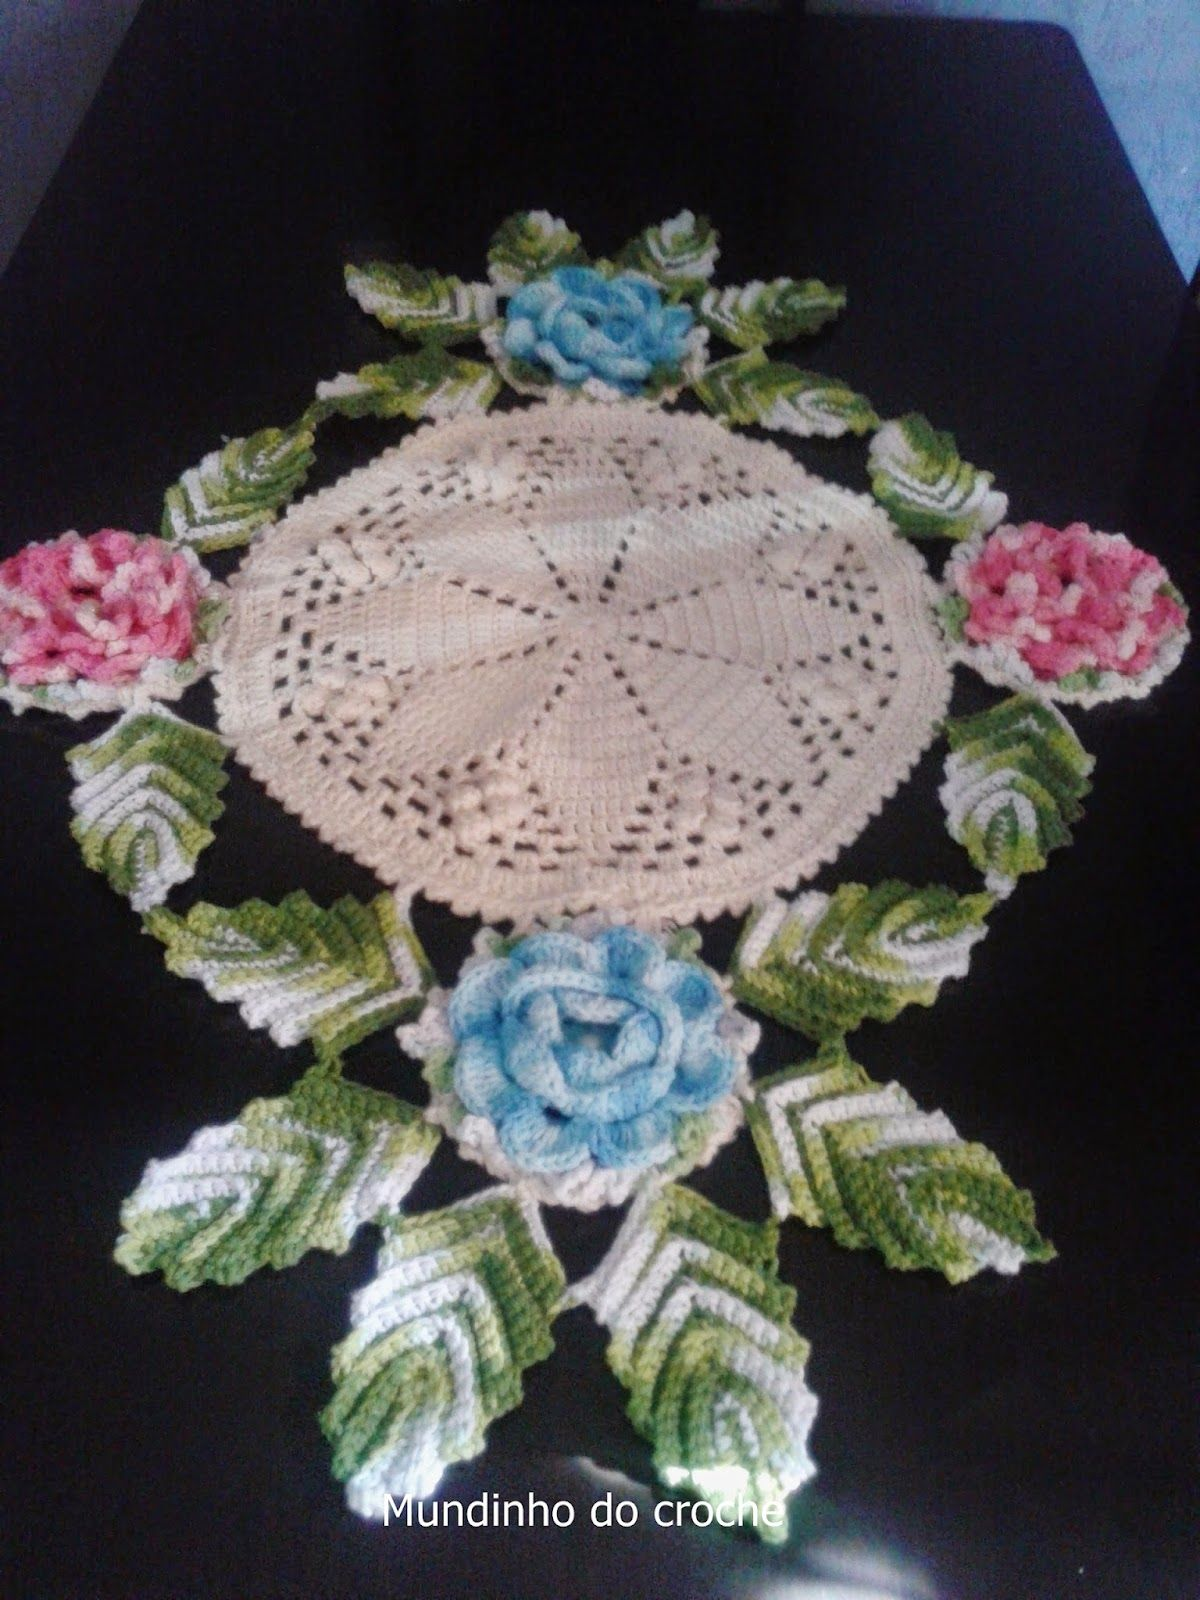 Mundinho do crochê: Centro de Mesa | crochê | Pinterest | Muster ...